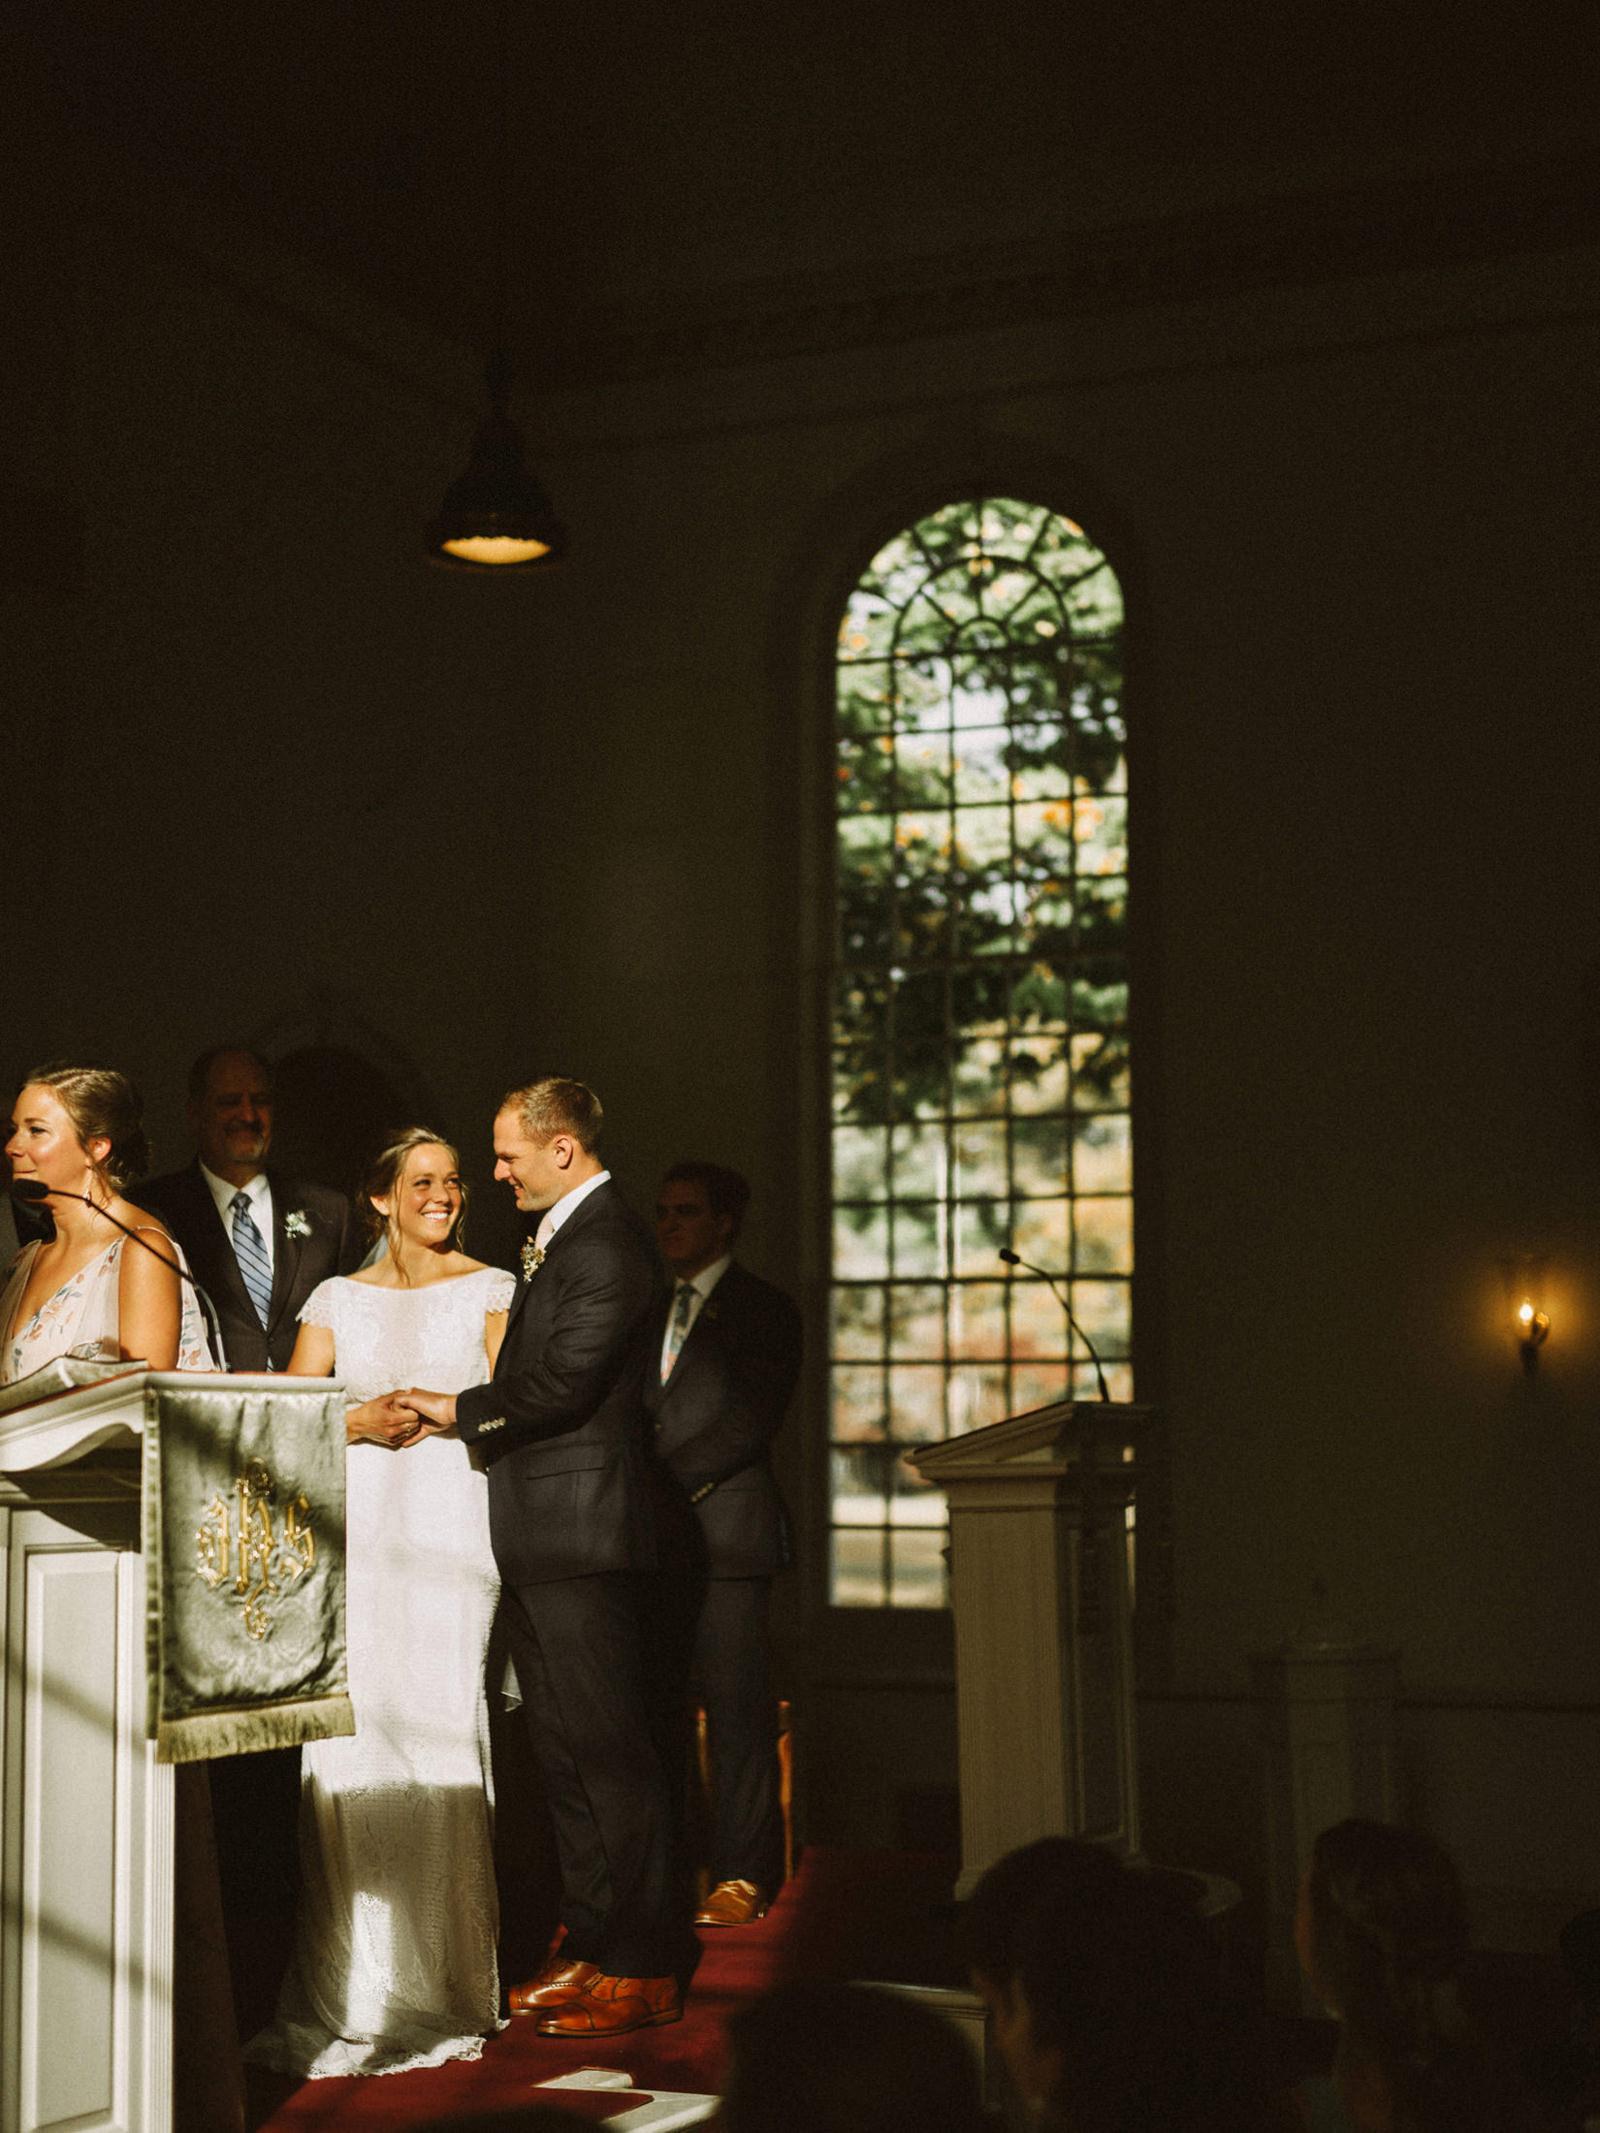 bridgeport-wedding-075 BRIDGEPORT, CONNECTICUT BACKYARD WEDDING